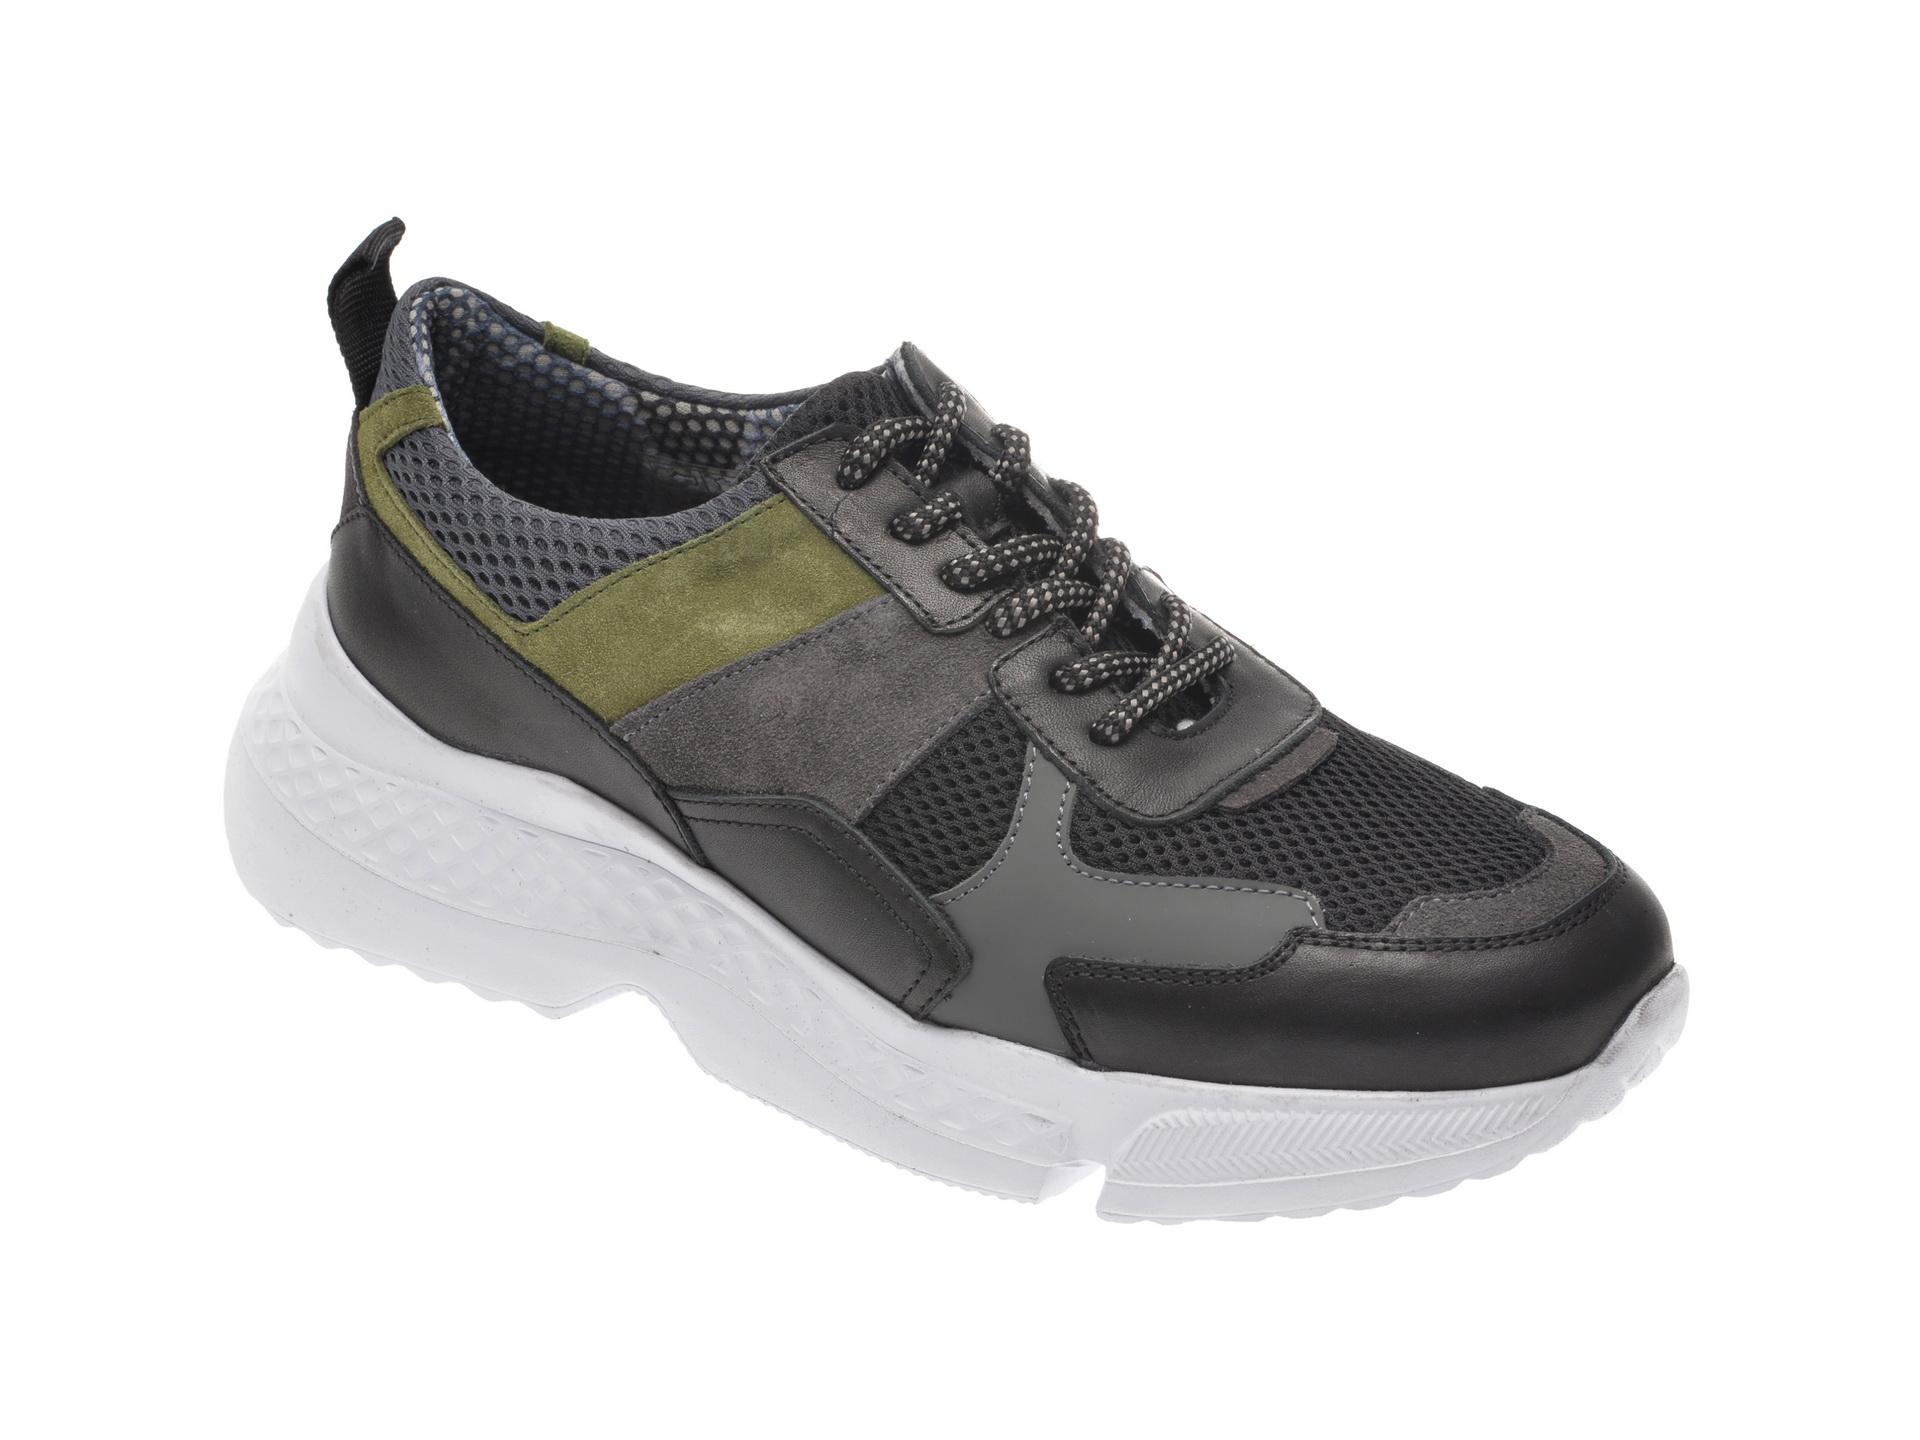 Pantofi Sport Otter Negri, 105, Din Material Textil Si Piele Naturala